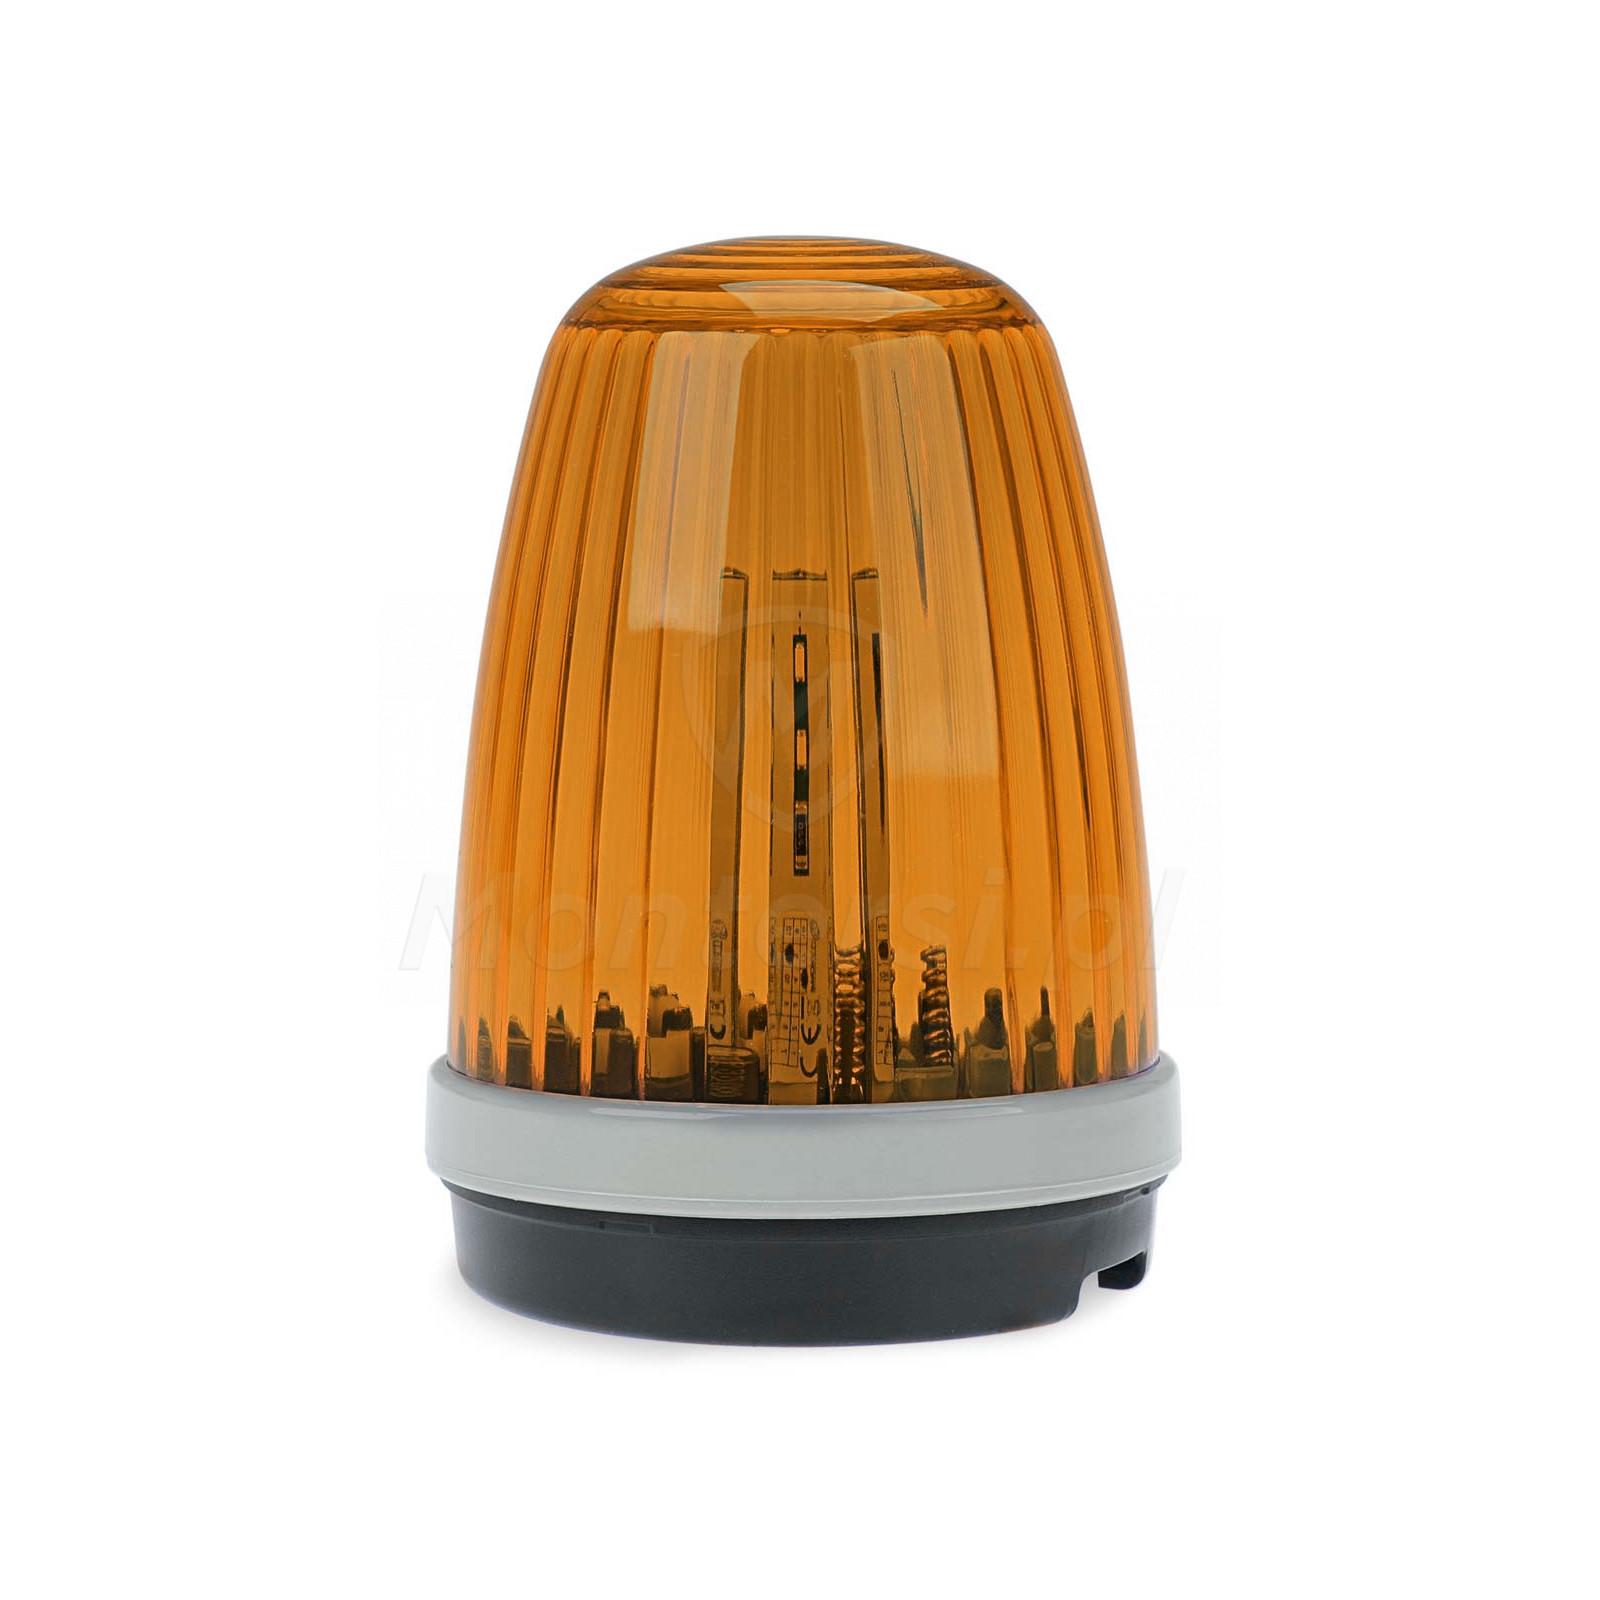 Ledunit - Lampa sygnalizacyjna LED, antena 433.92MHz